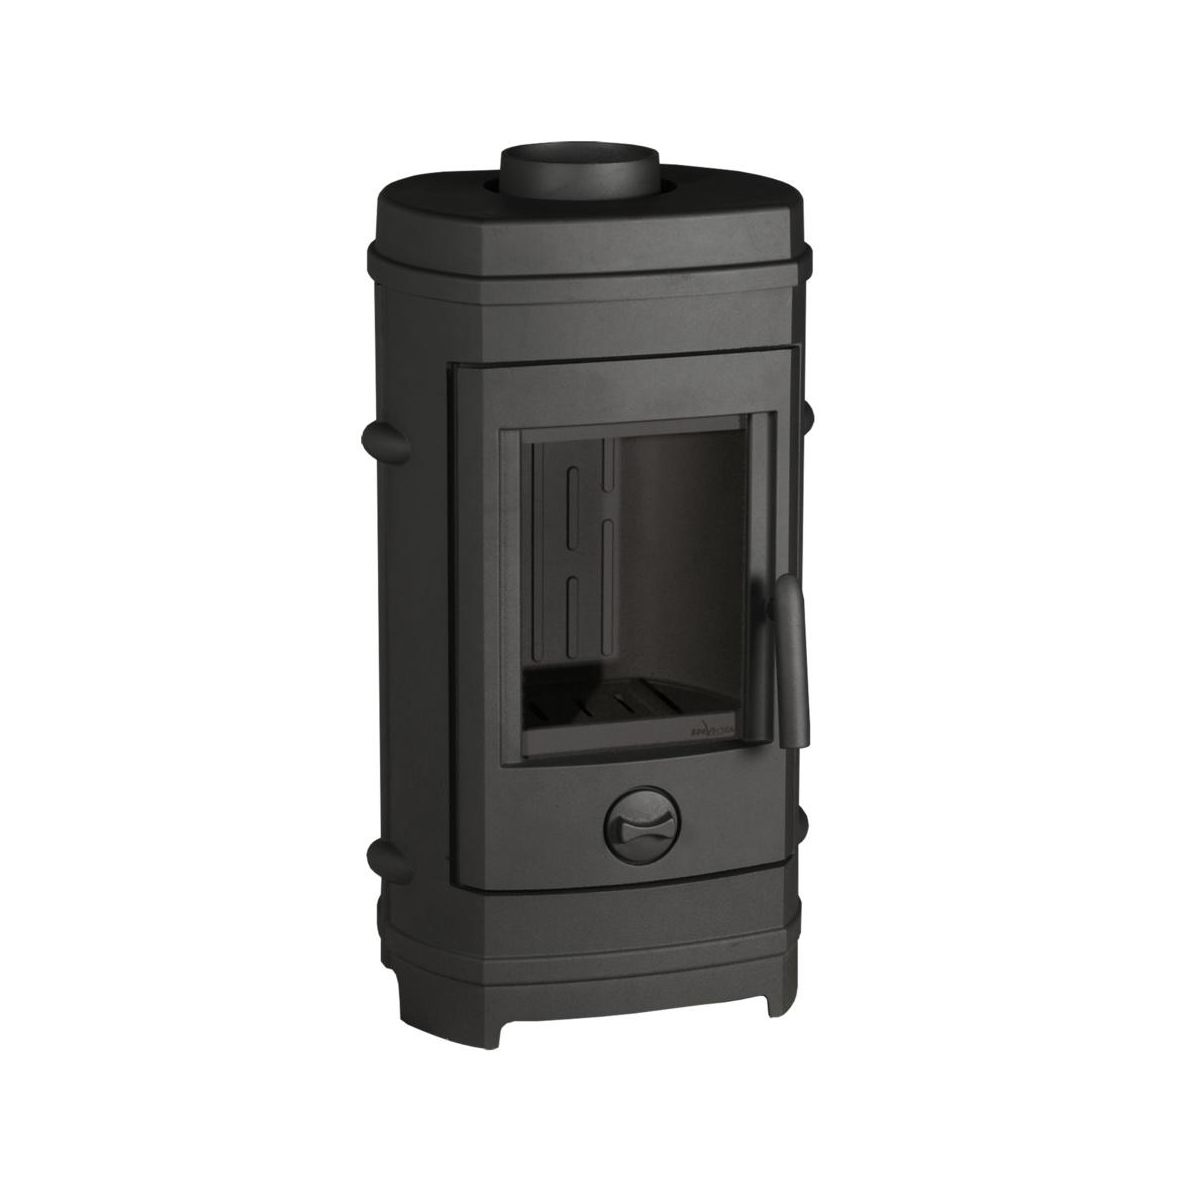 piec wolnostoj cy remilly invicta piece kominkowe w. Black Bedroom Furniture Sets. Home Design Ideas